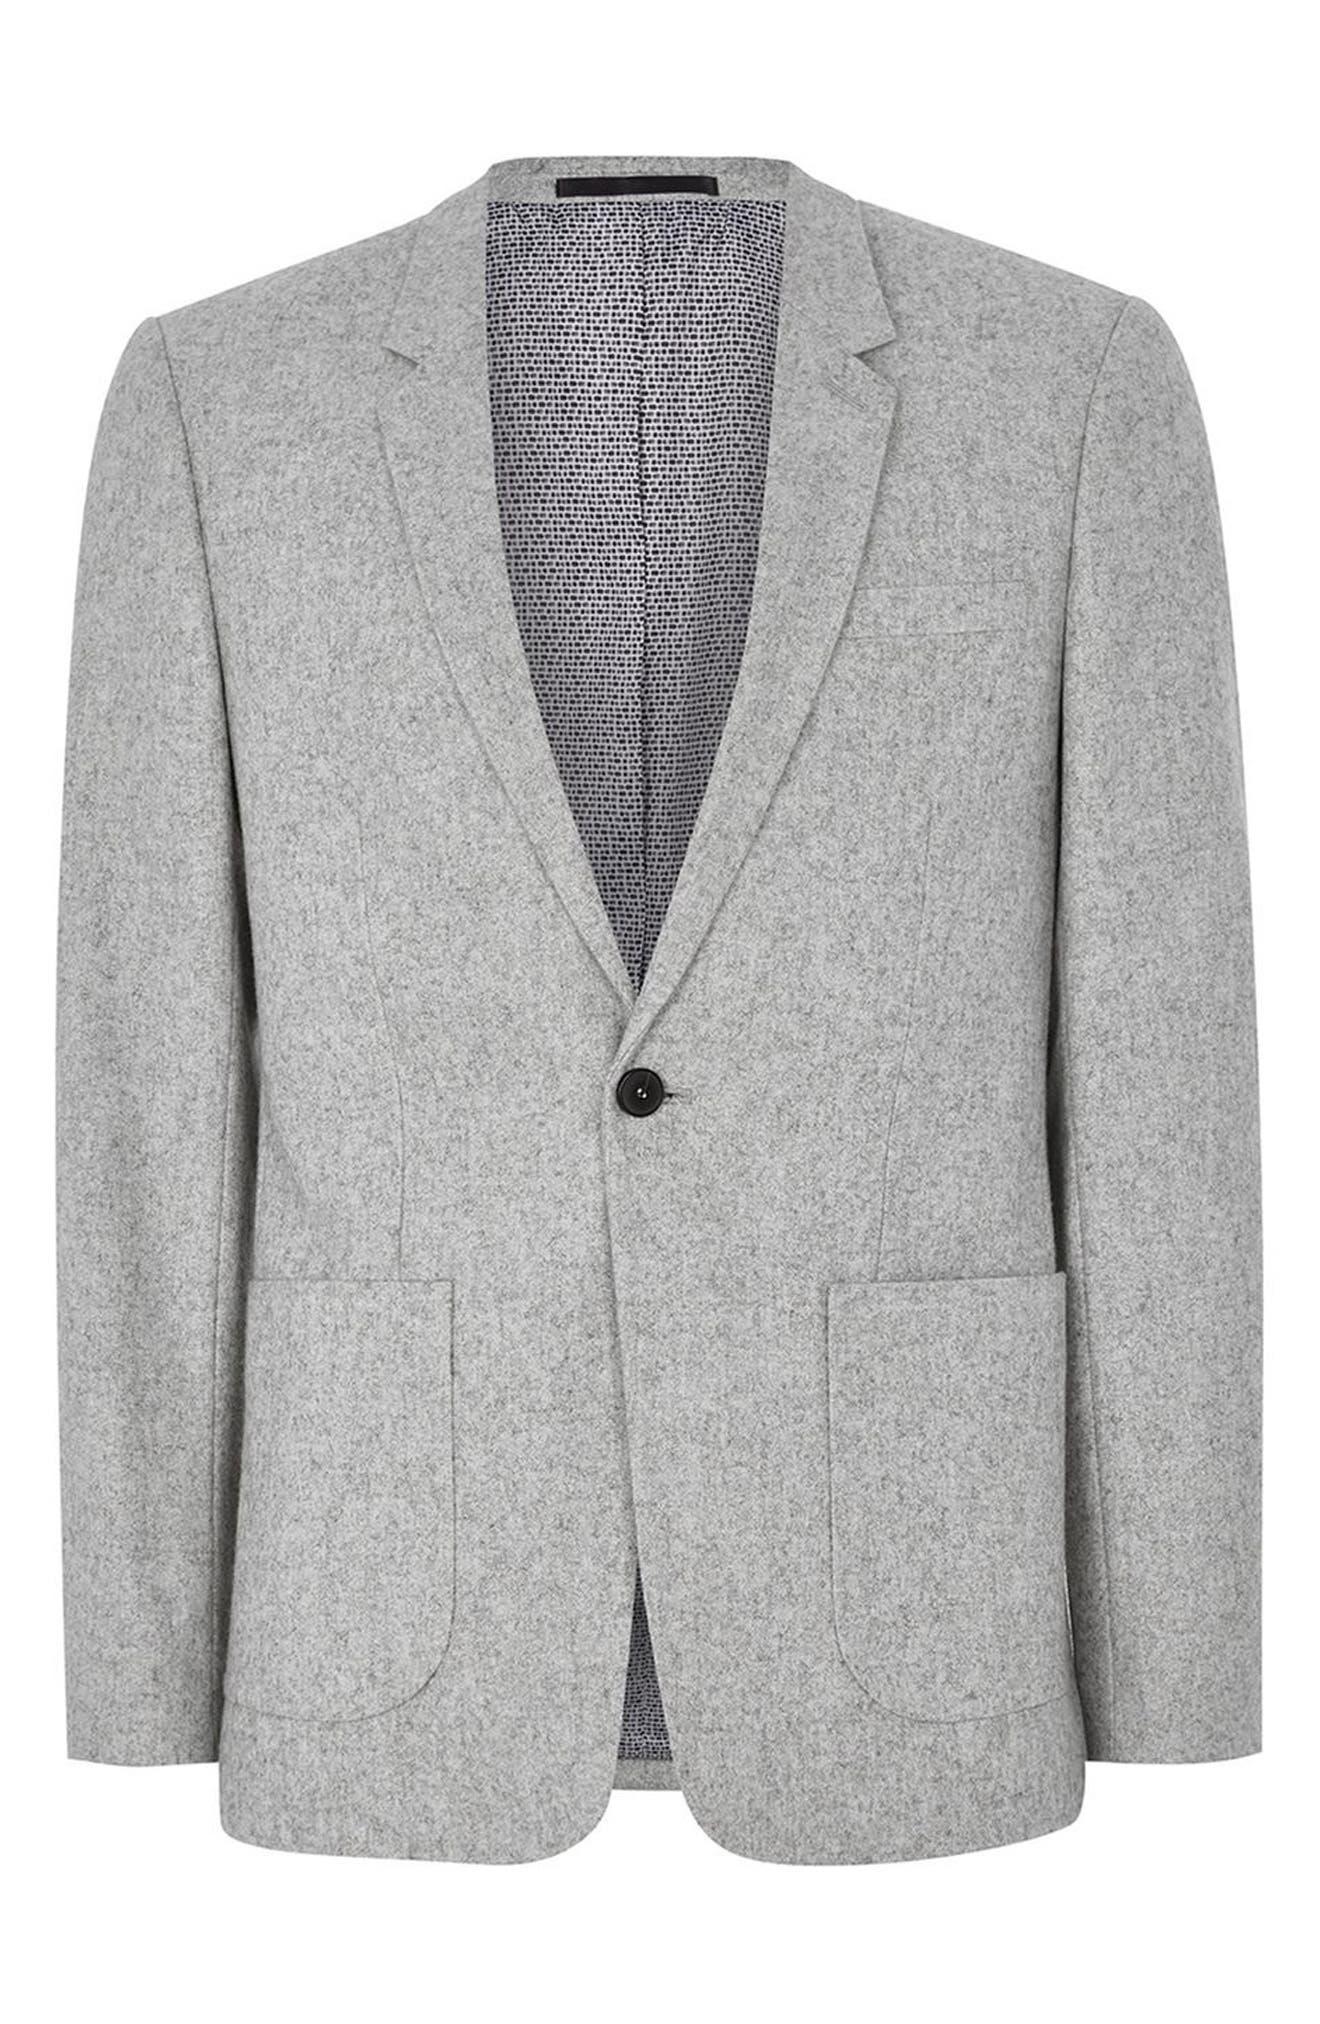 Murdoch One-Button Jacket,                             Alternate thumbnail 4, color,                             LIGHT GREY